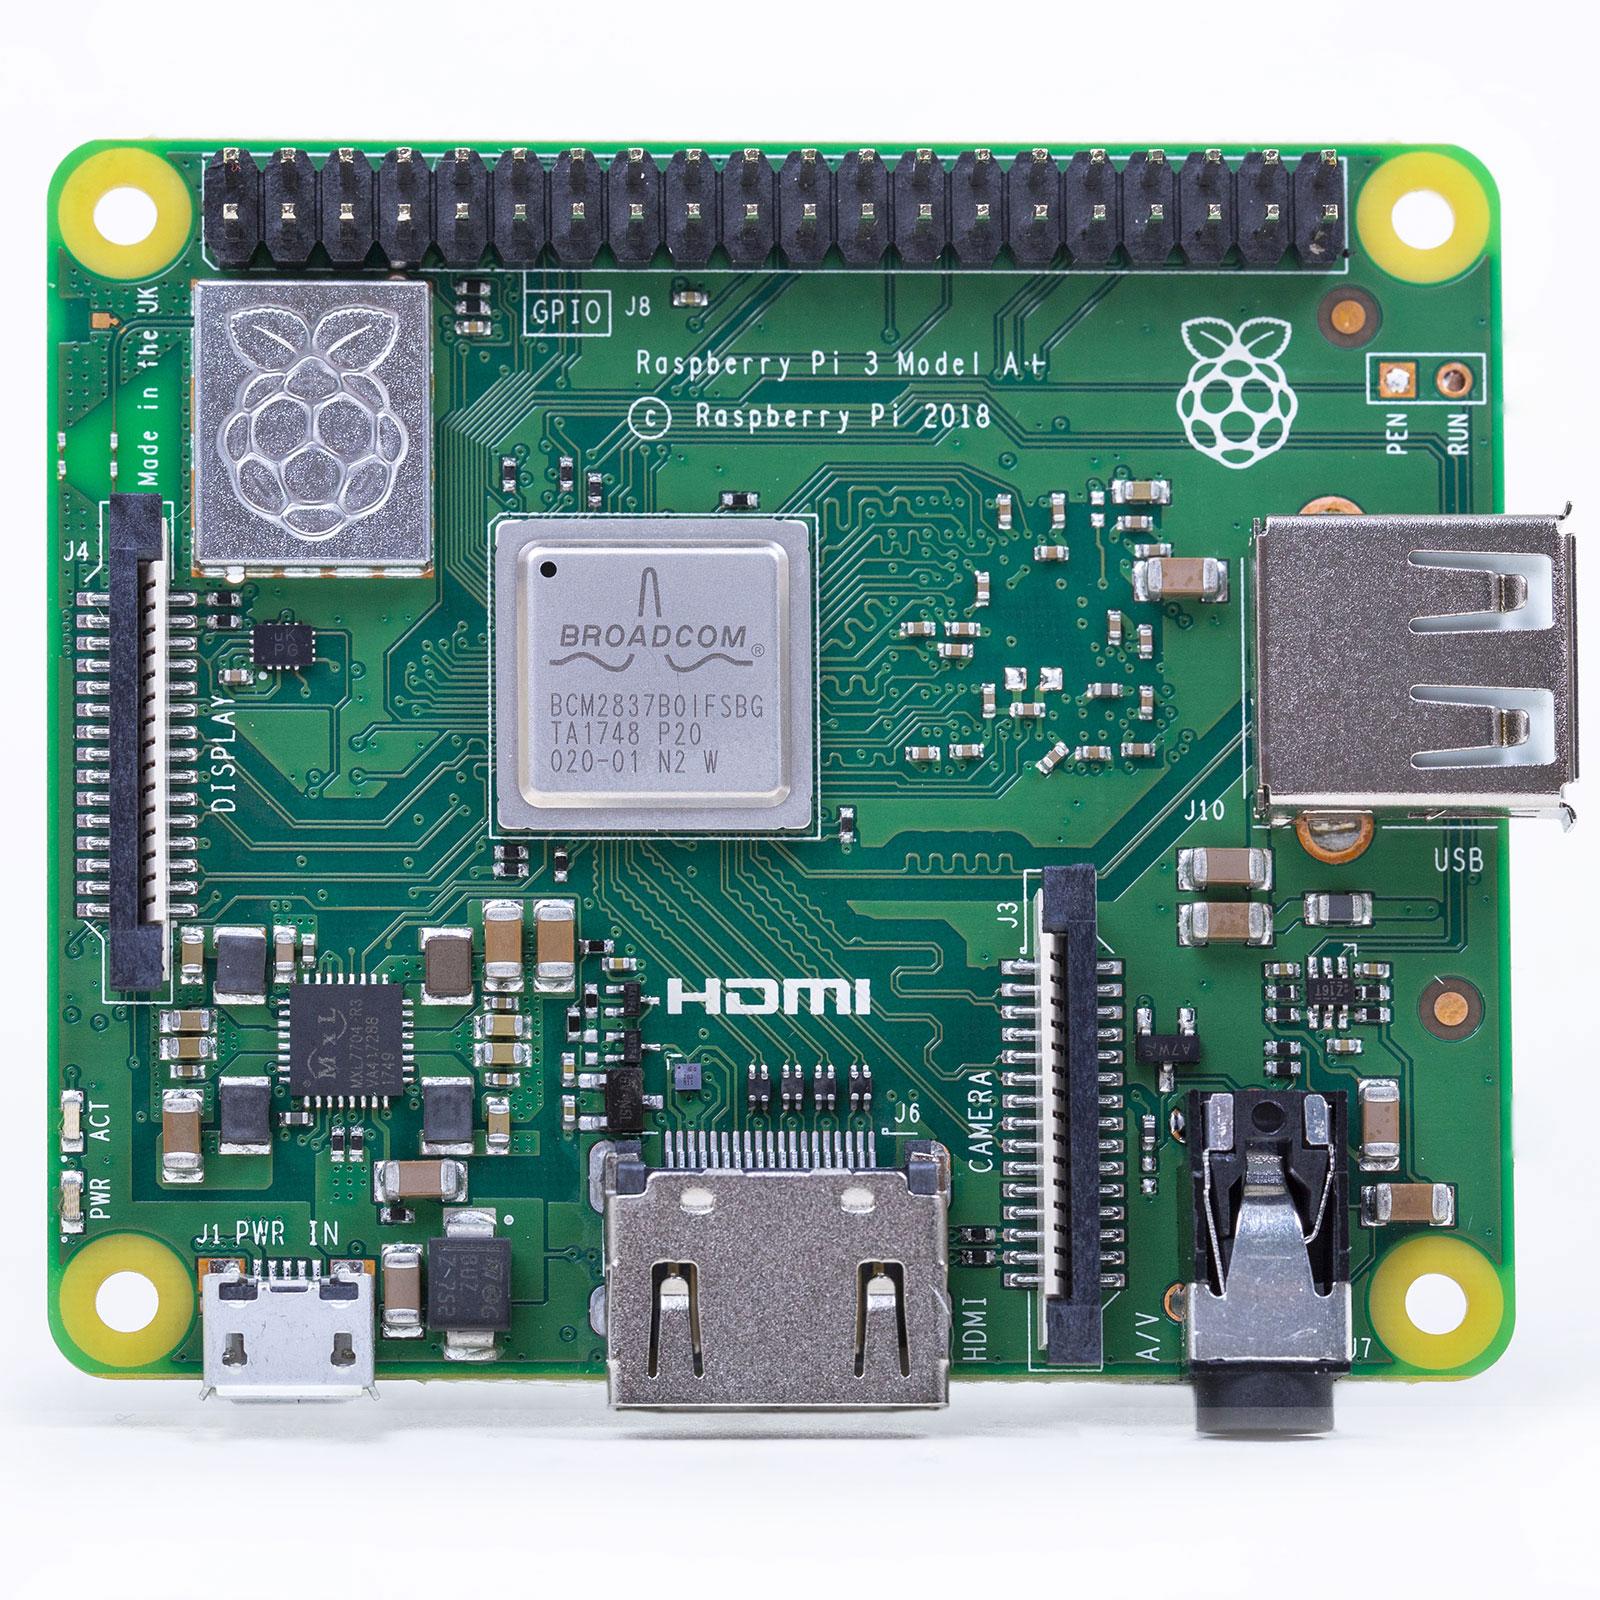 Carte Raspberry Pi Raspberry Pi 3 Model A+ Carte mère ultra-compacte avec processeur ARM Cortex-A53 Quad-Core 1.4 GHz - RAM 512 Mo - HDMI - USB 2.0 - Wi-Fi AC Dual Band - Bluetooth 4.2